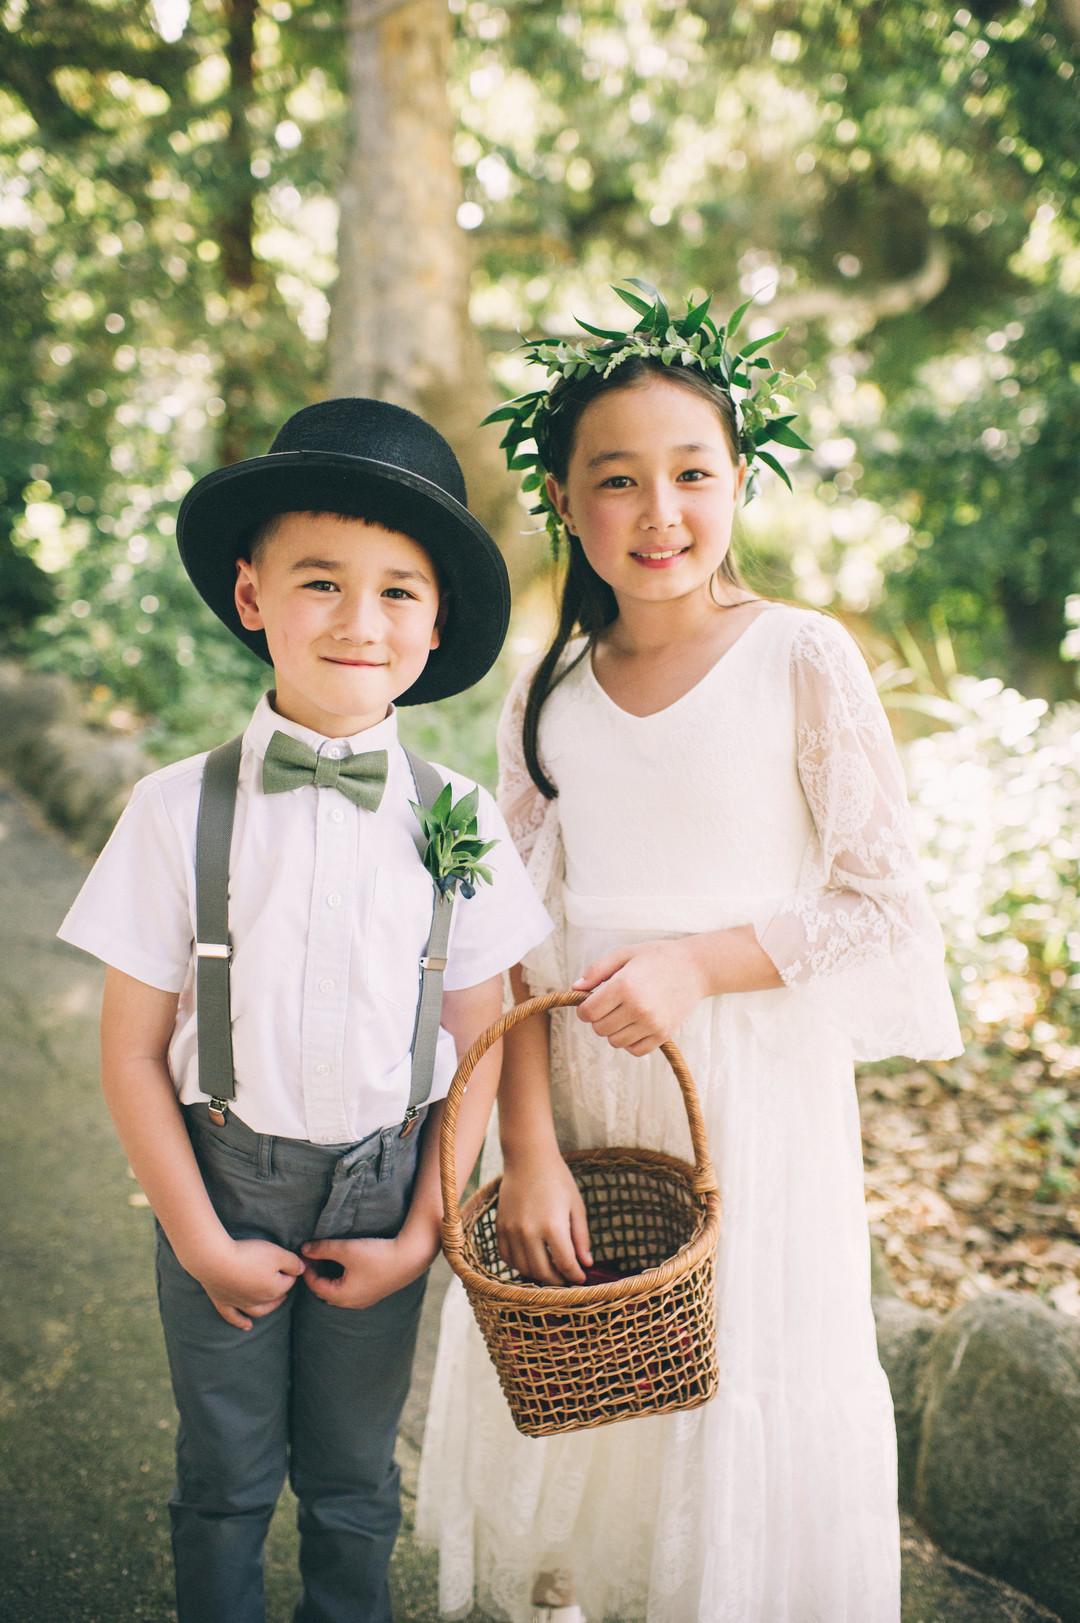 www.santabarbarawedding.com | Sarah Katherine Davis Photography | Santa Barbara Museum of Natural History | Wild Heart Events | Ella and Louie | Flower Girl and Ring Bearer